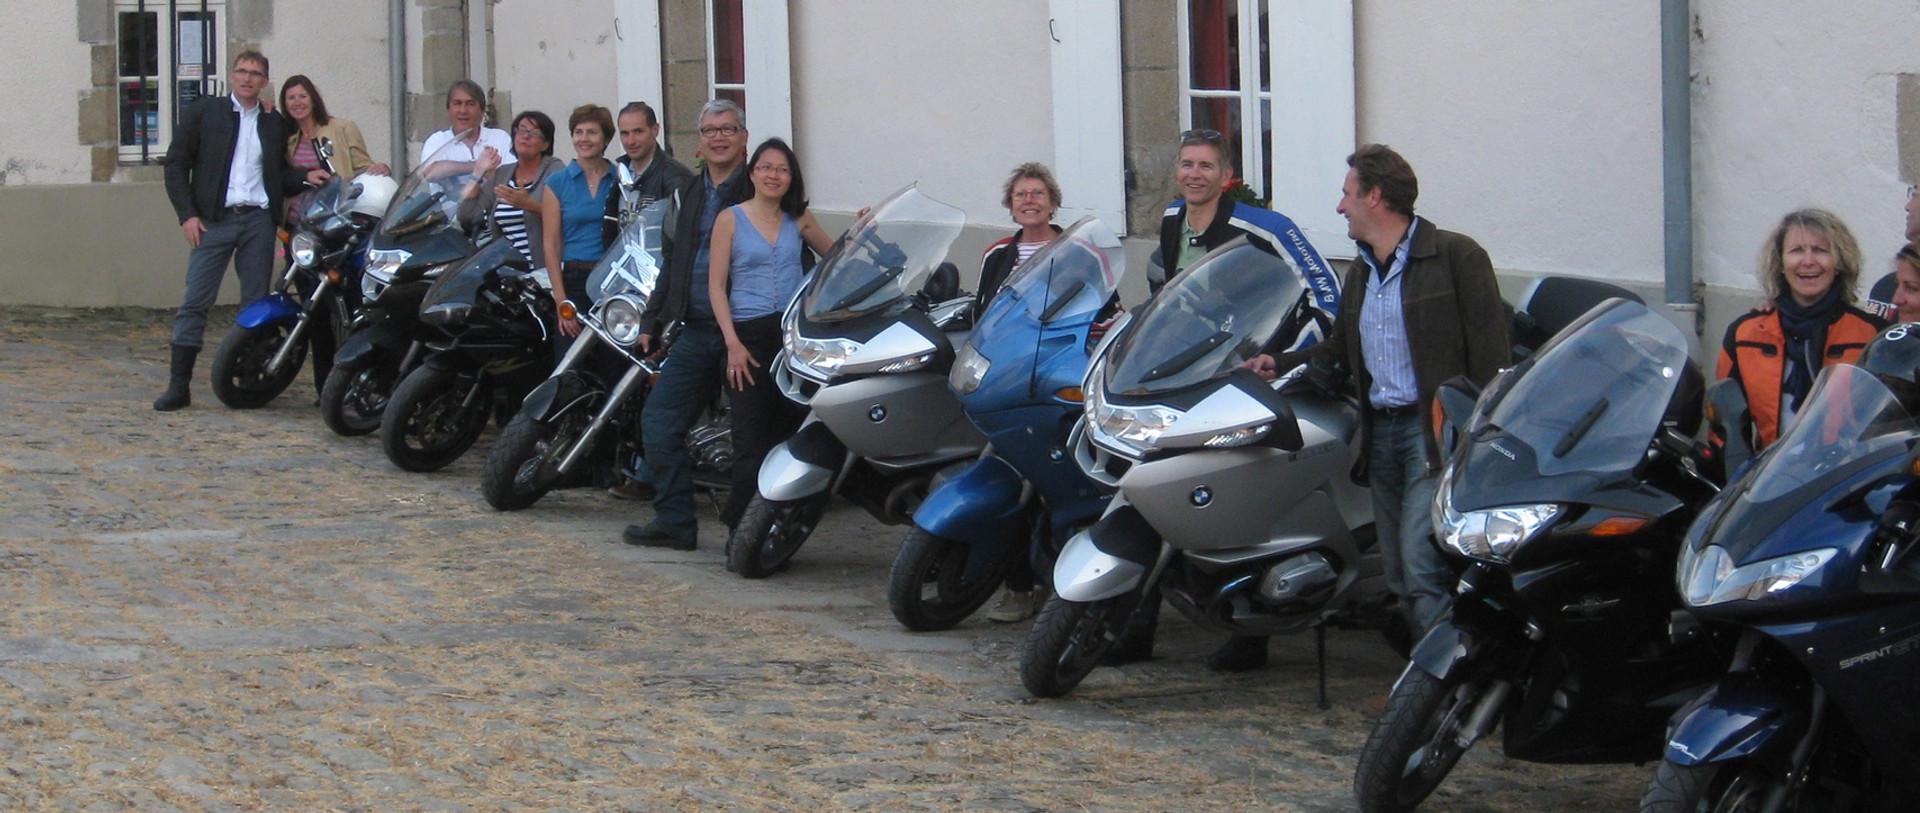 TOURING THROUGH CENTRAL FRANCE